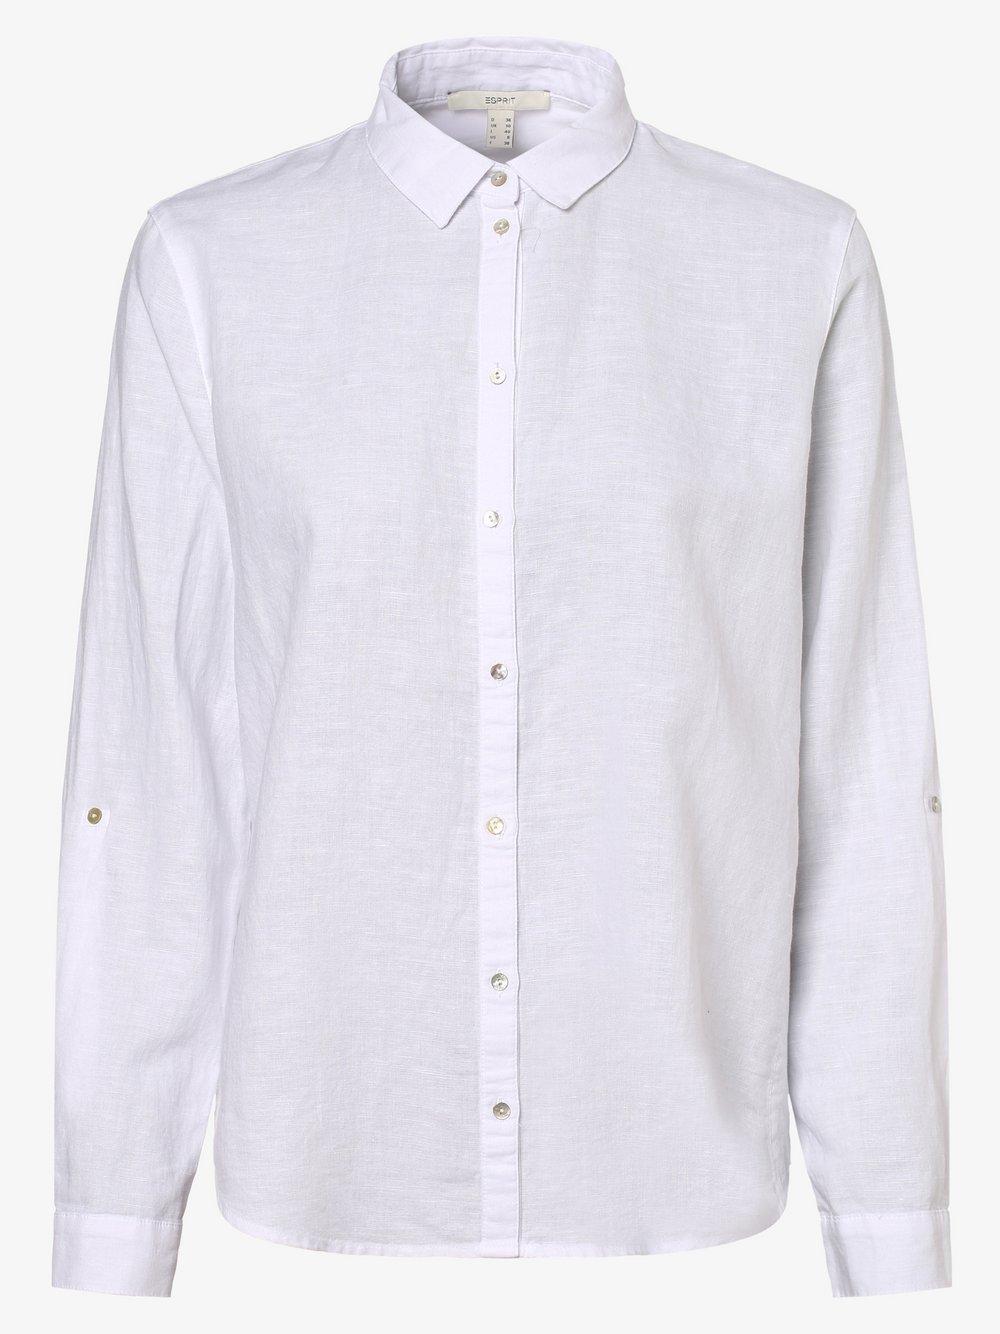 Esprit Casual – Bluzka damska z dodatkiem lnu, biały Van Graaf 471804-0001-00360